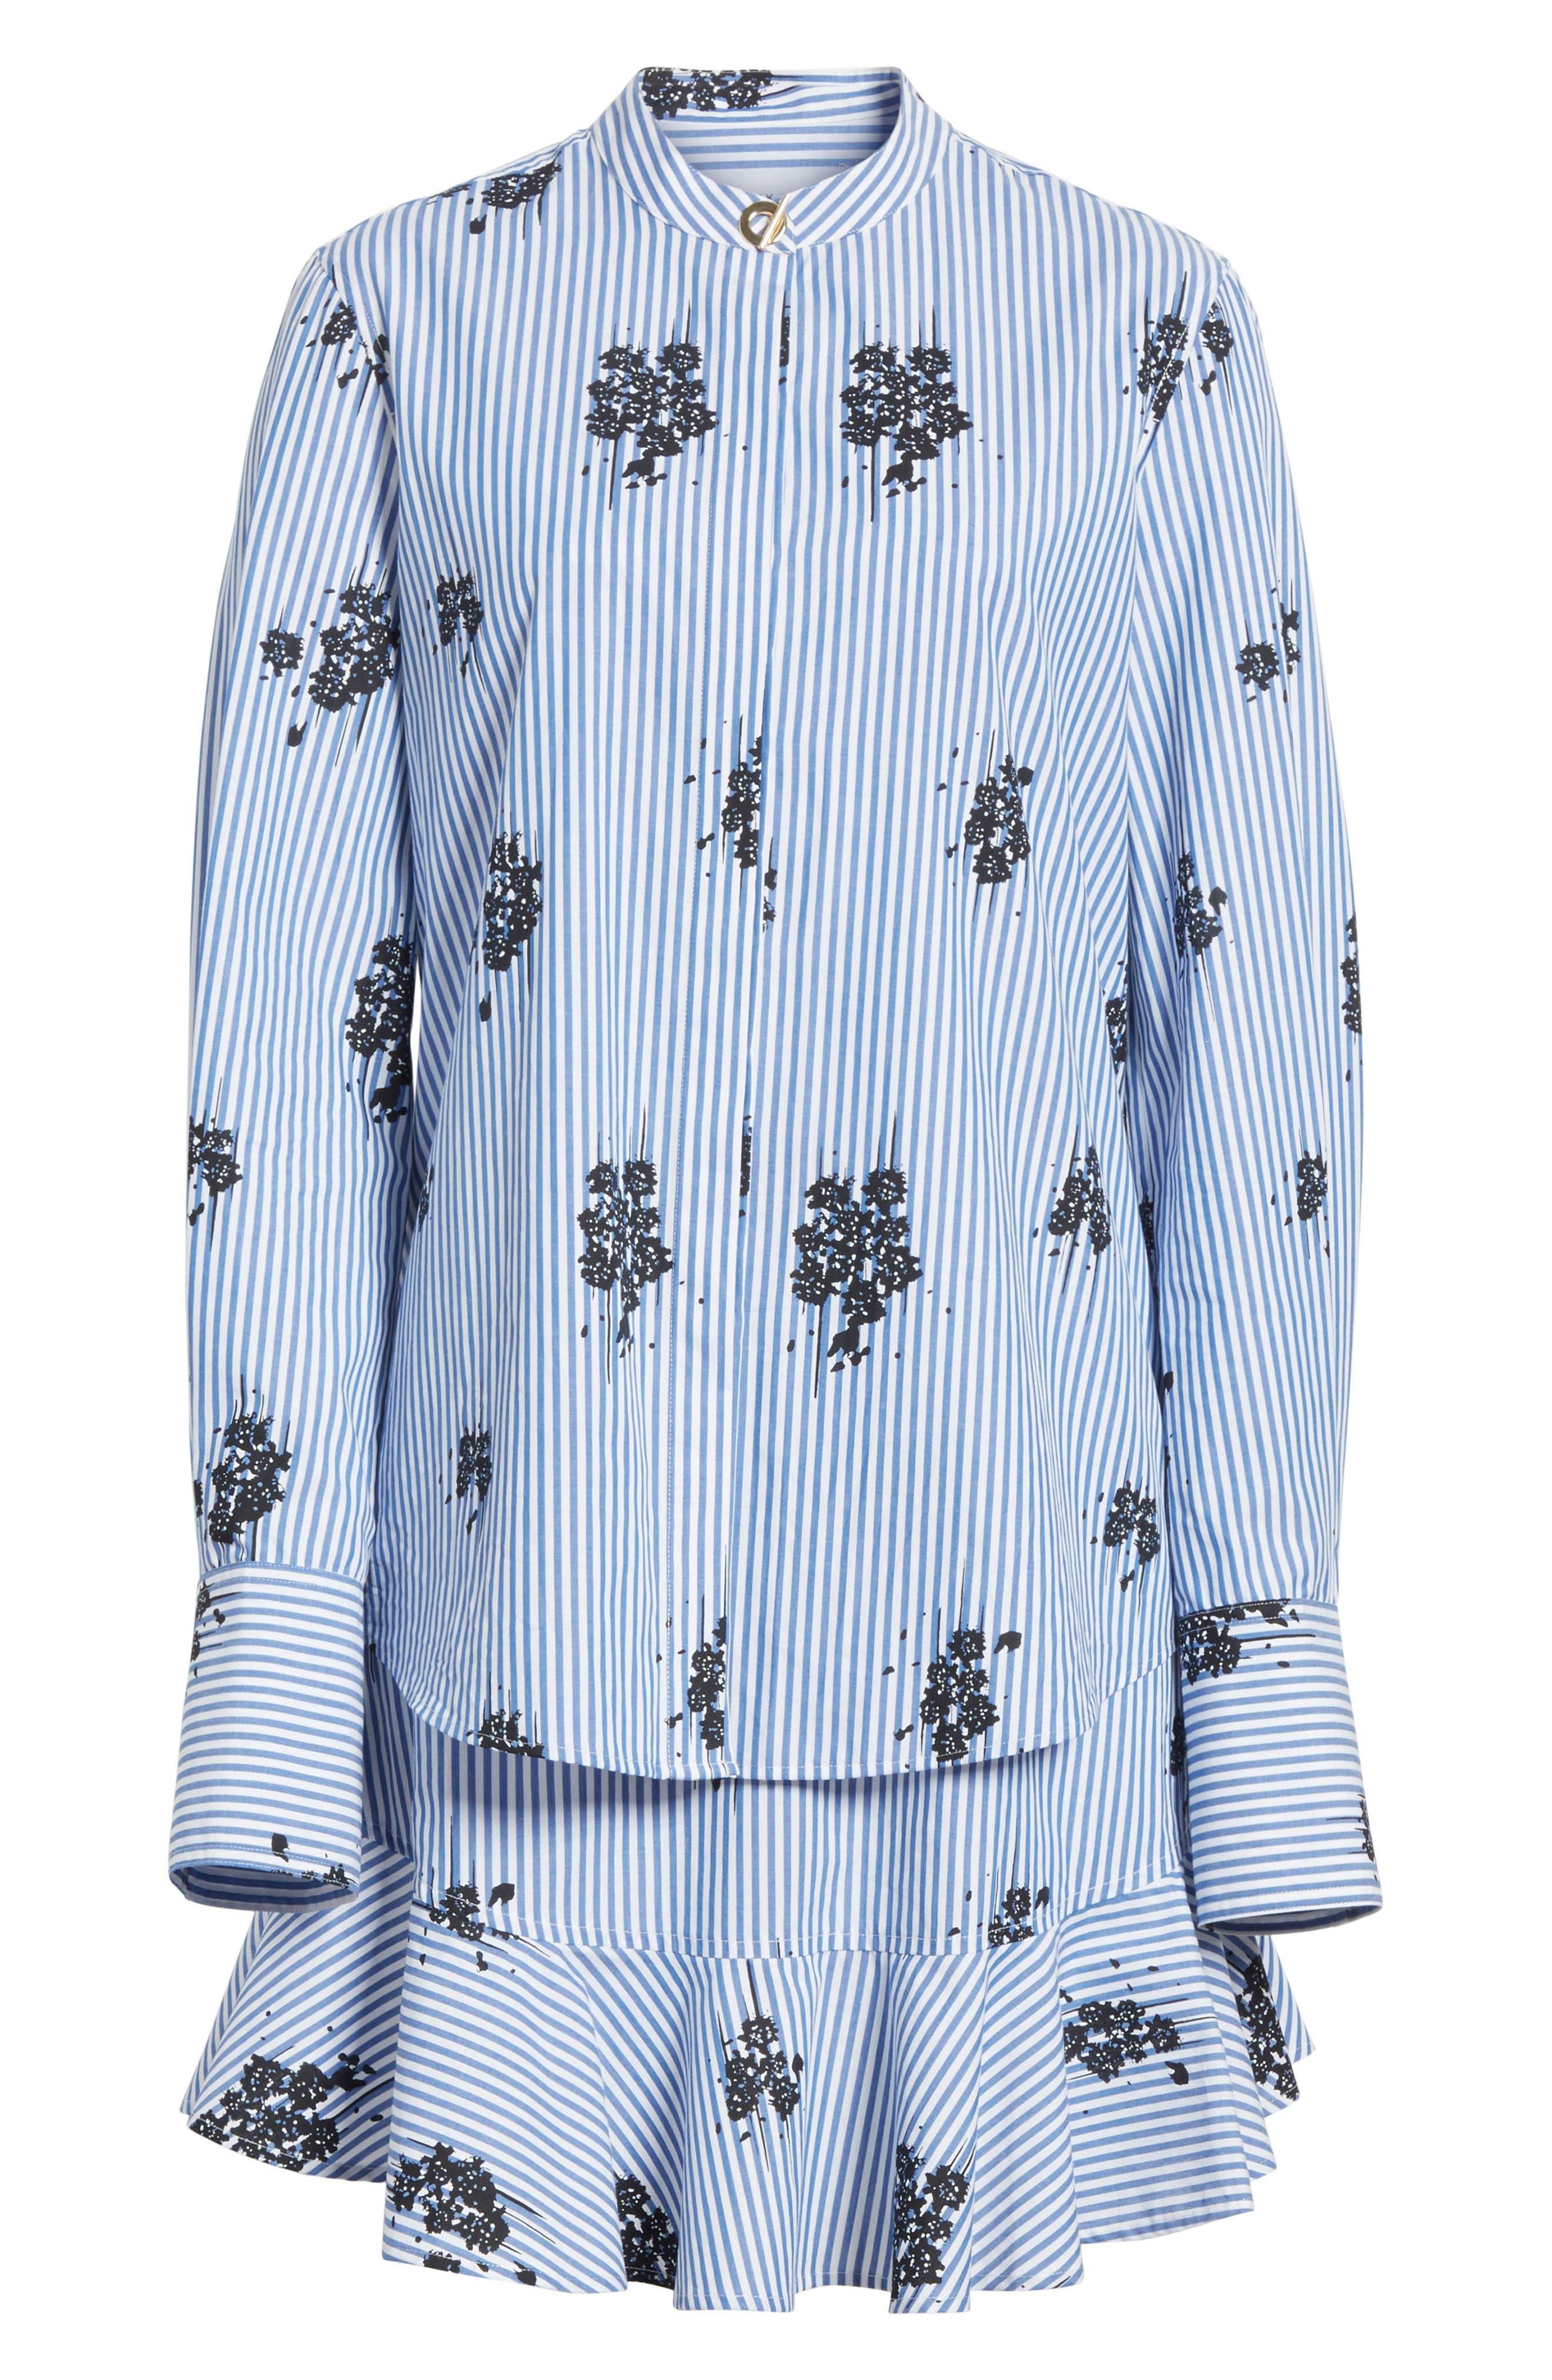 2-in-1 Ruffled Shirtdress,                             Alternate thumbnail 7, color,                             Blue